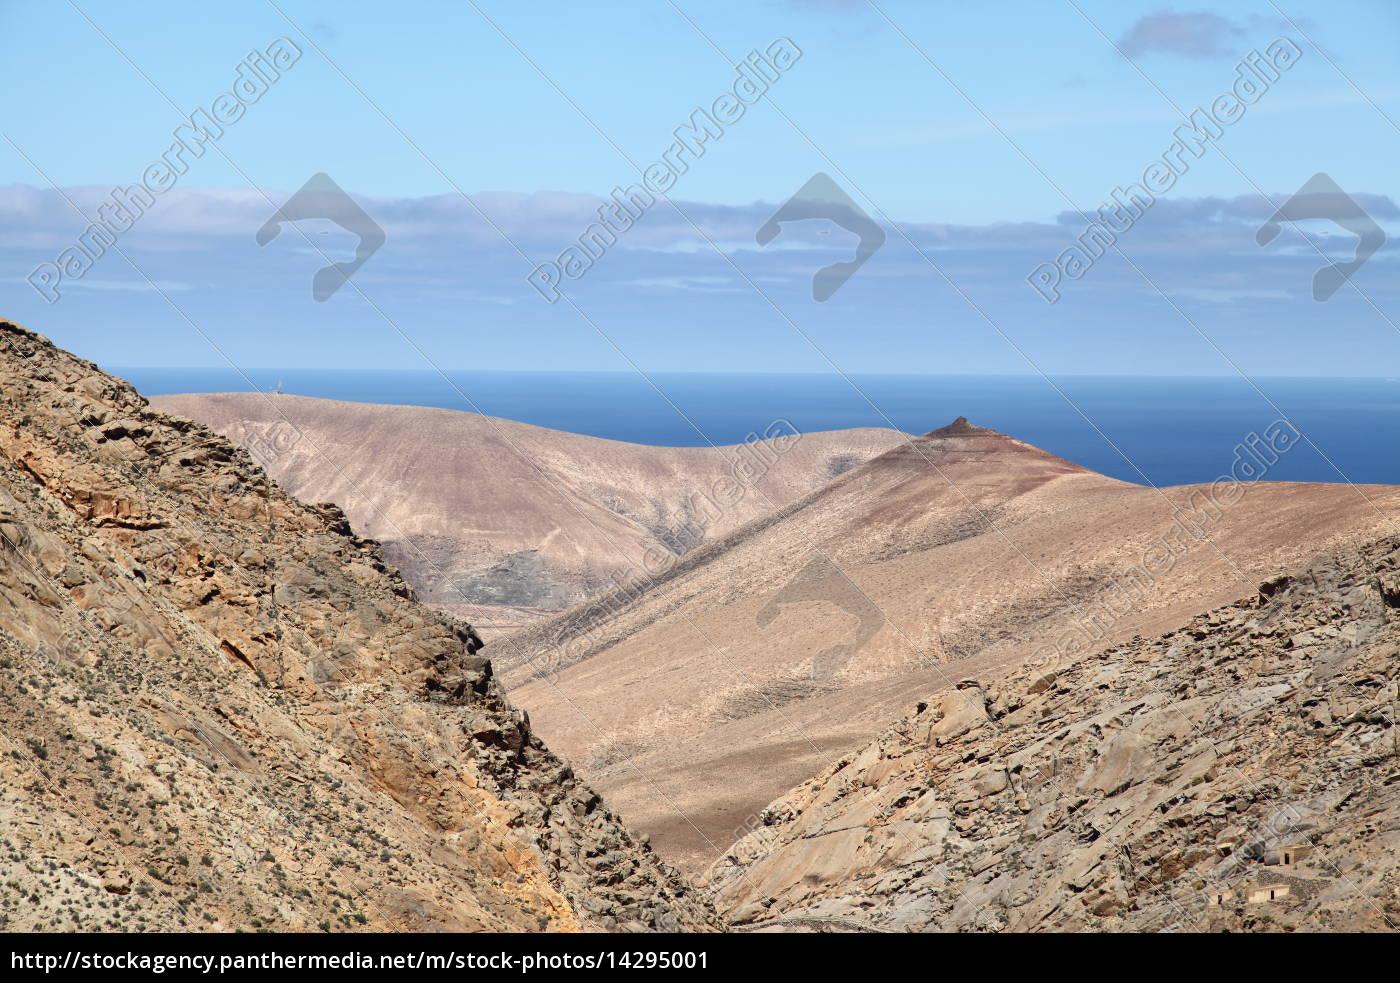 Fuerteventura, Kanarischen Inseln, Kanaren, Natur, Berge, Hügel - 14295001